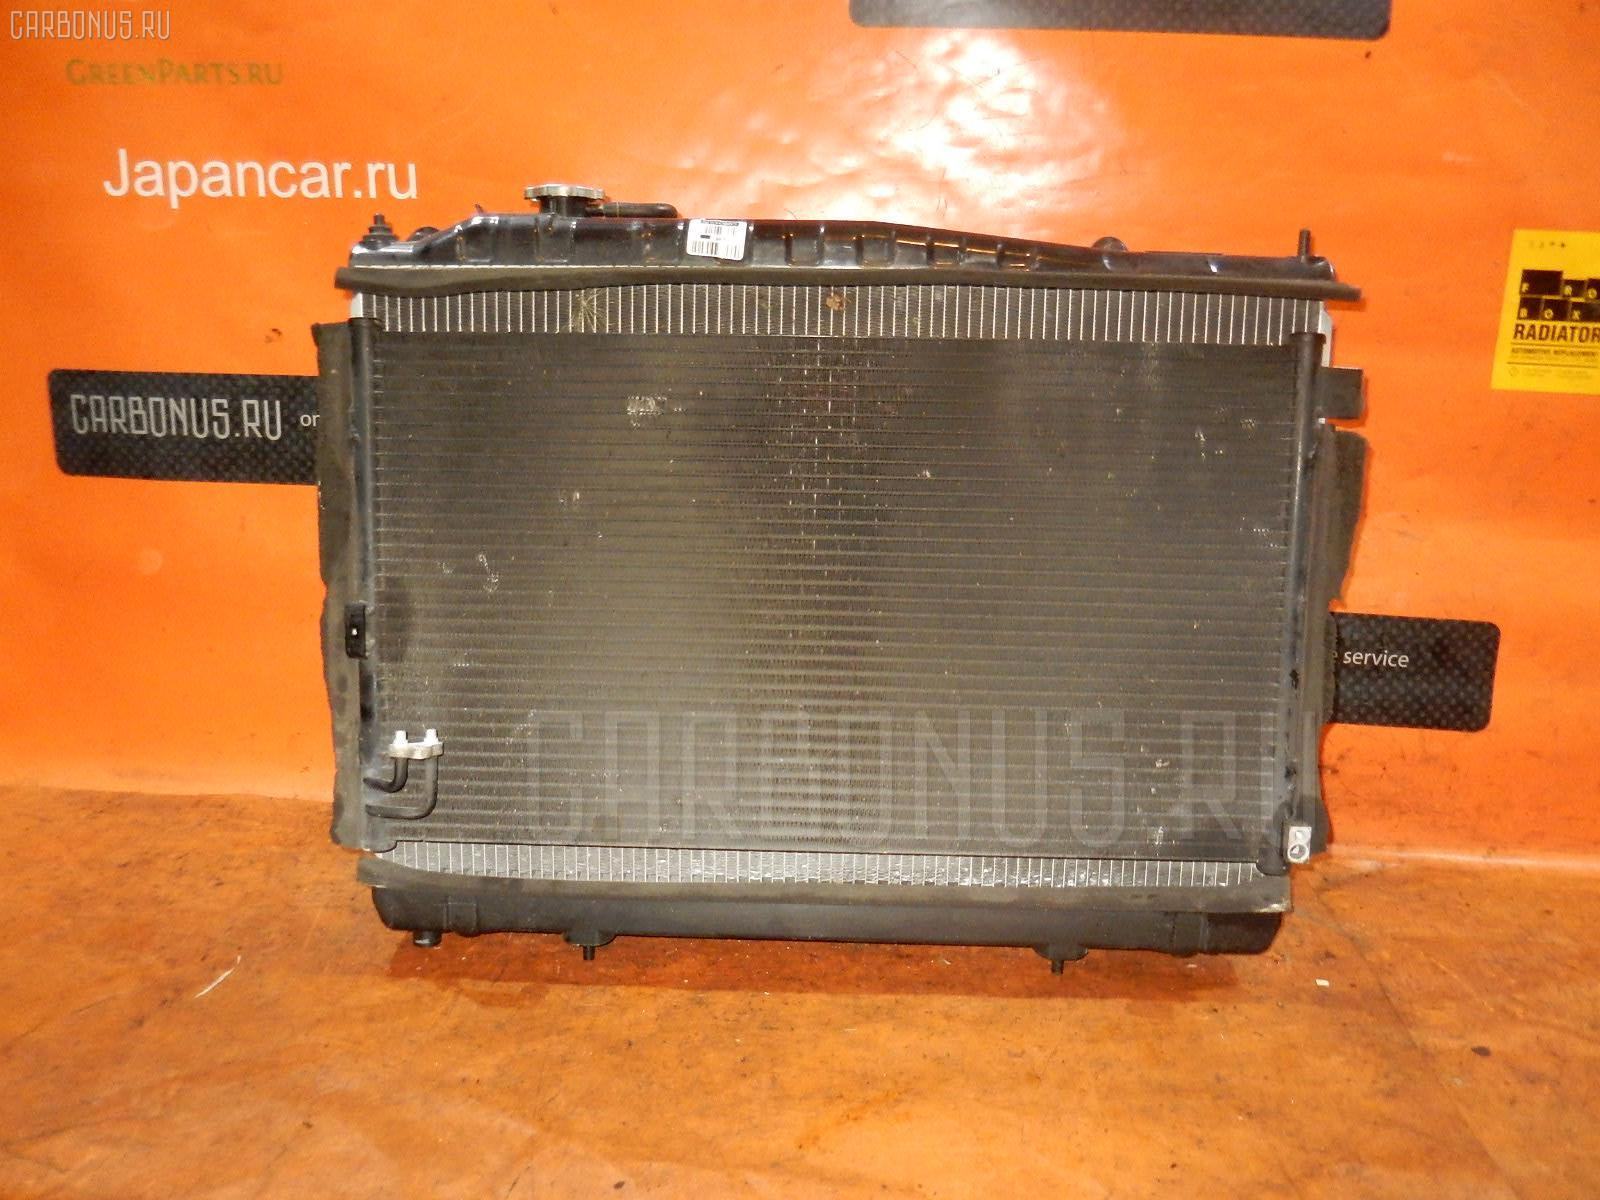 Радиатор ДВС NISSAN CEDRIC HY34 VQ30DET. Фото 6